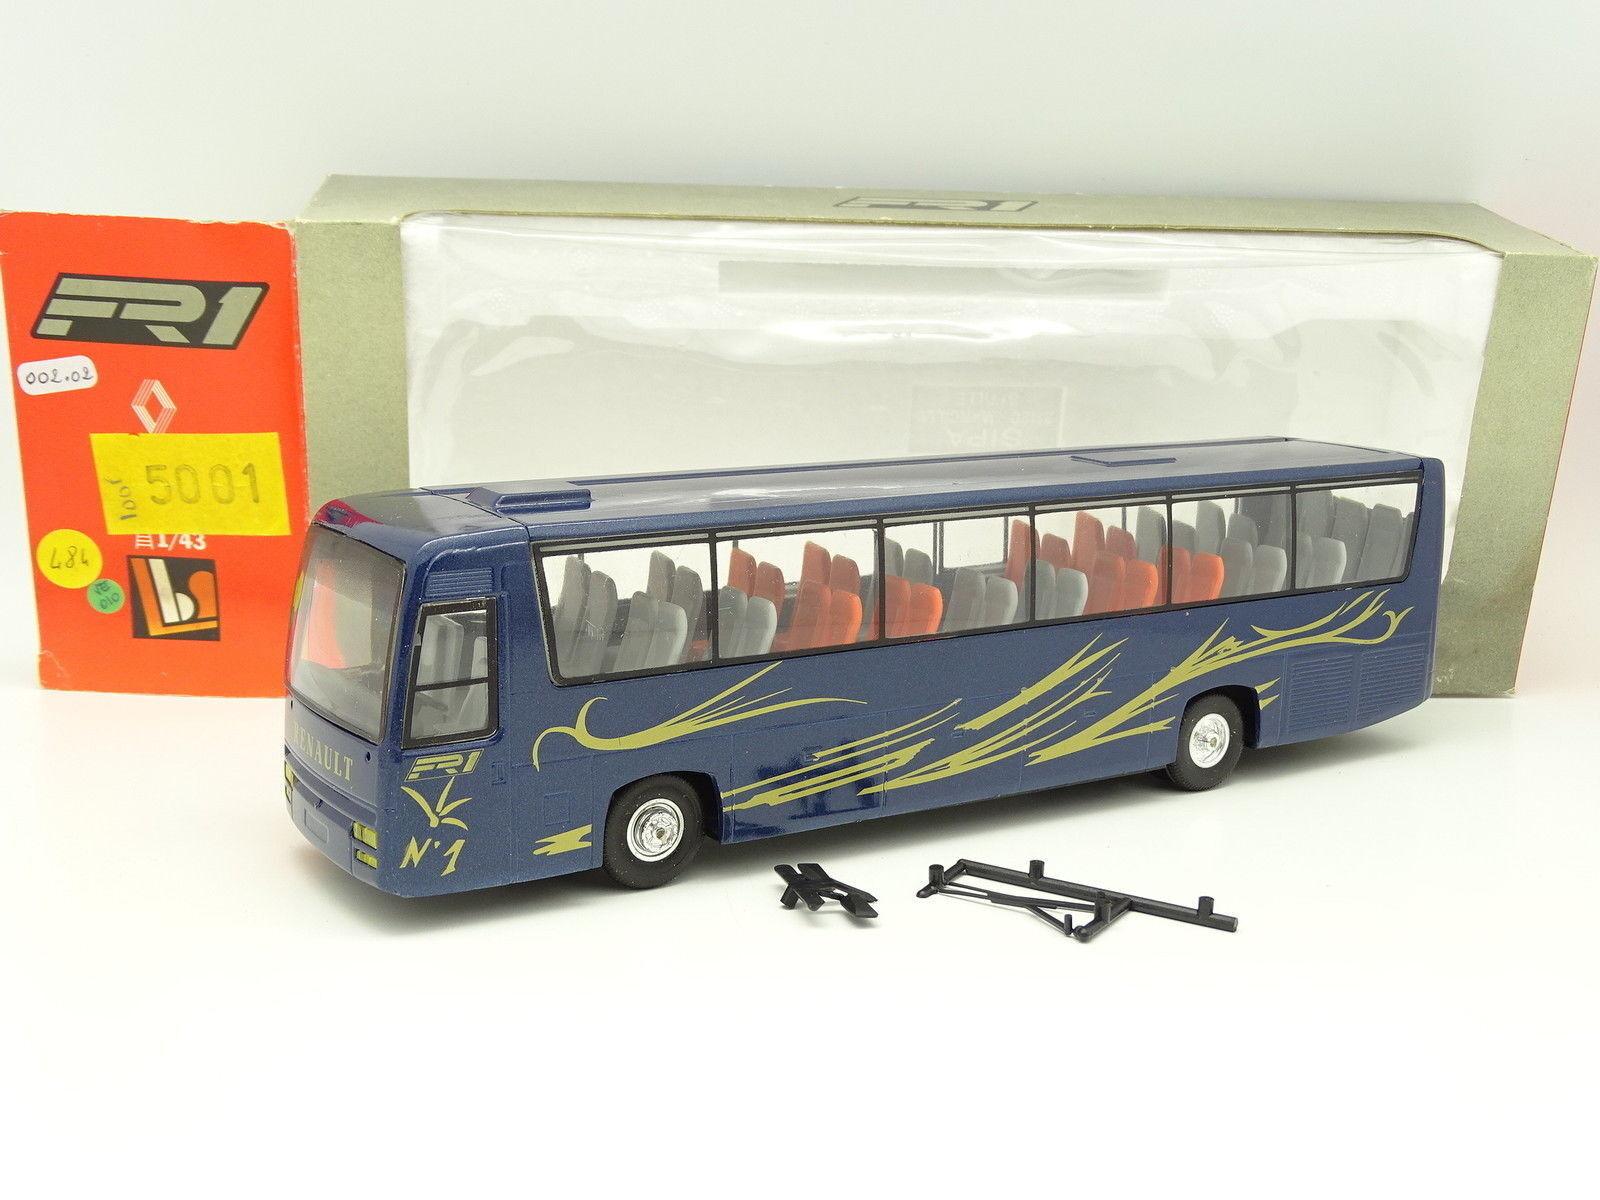 Eligor lbs 1   43 - bus auto autobus renault fr1 blau